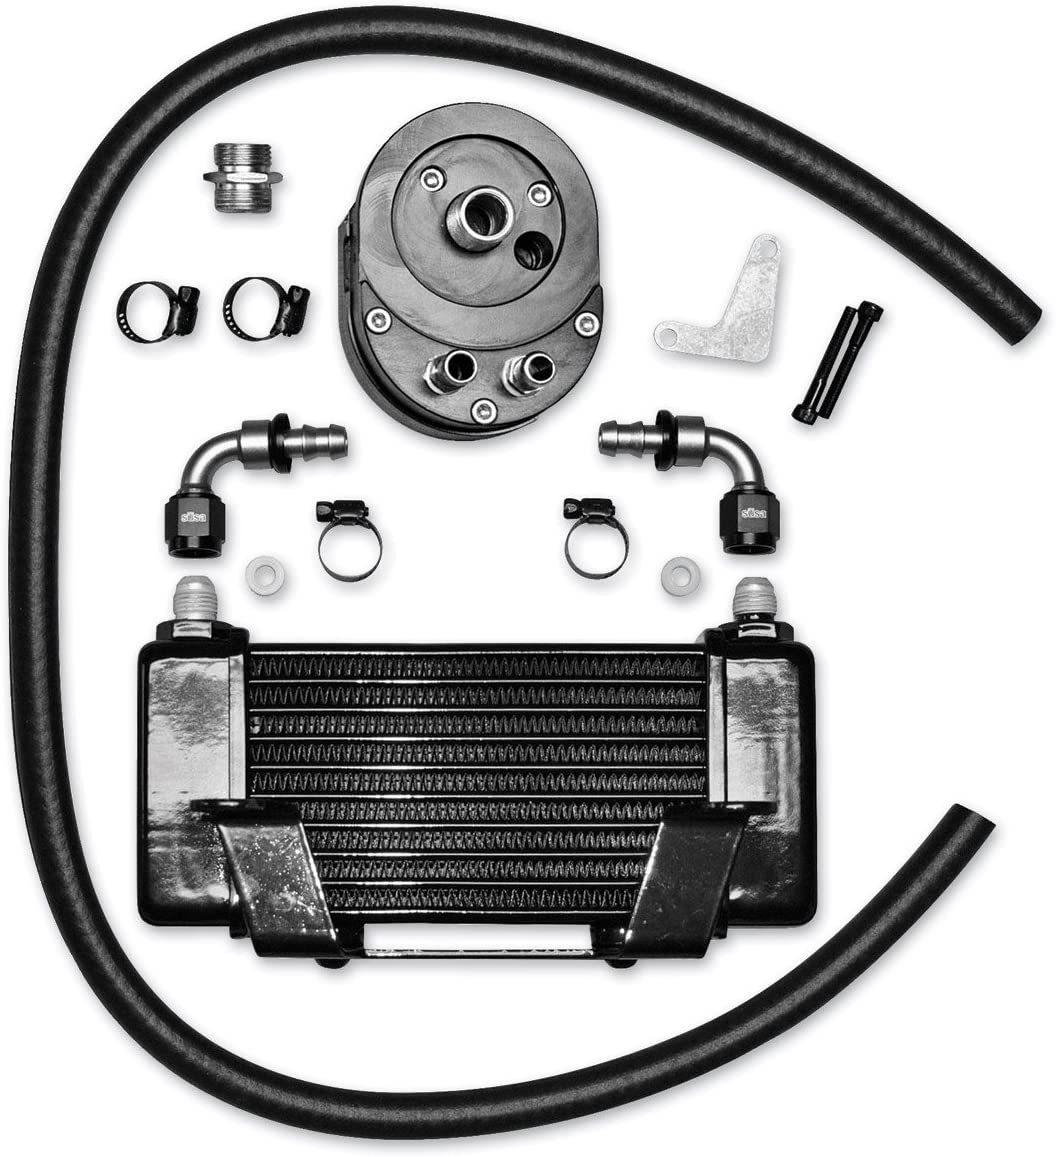 Jagg-Horizontal-Low-Mount-Oil-Cooler-Kit-for-Harley